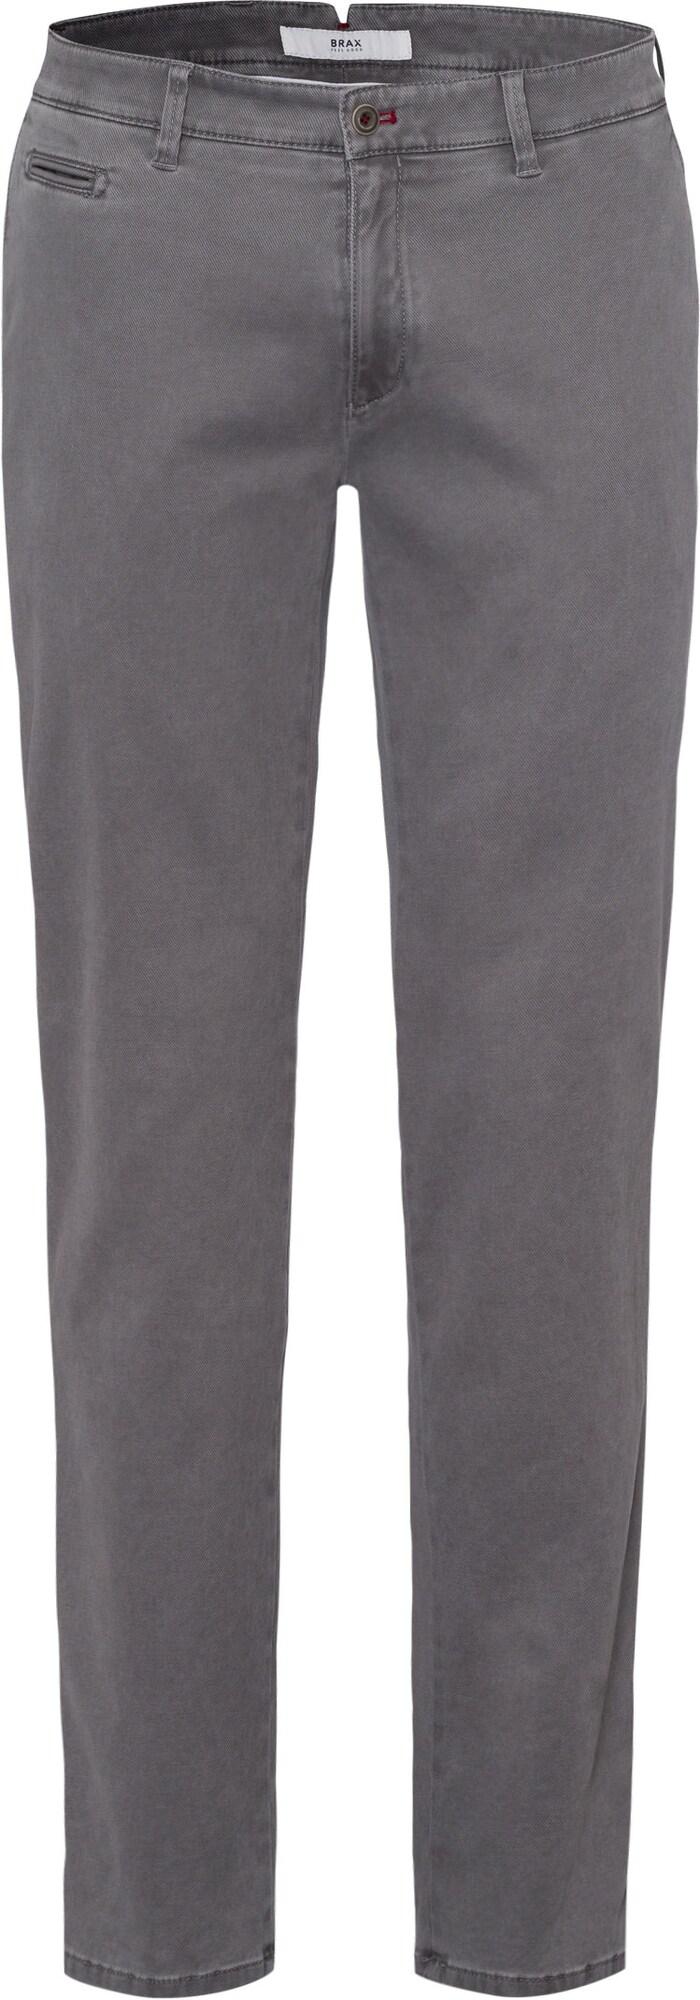 "BRAX ""Chino"" stiliaus kelnės"